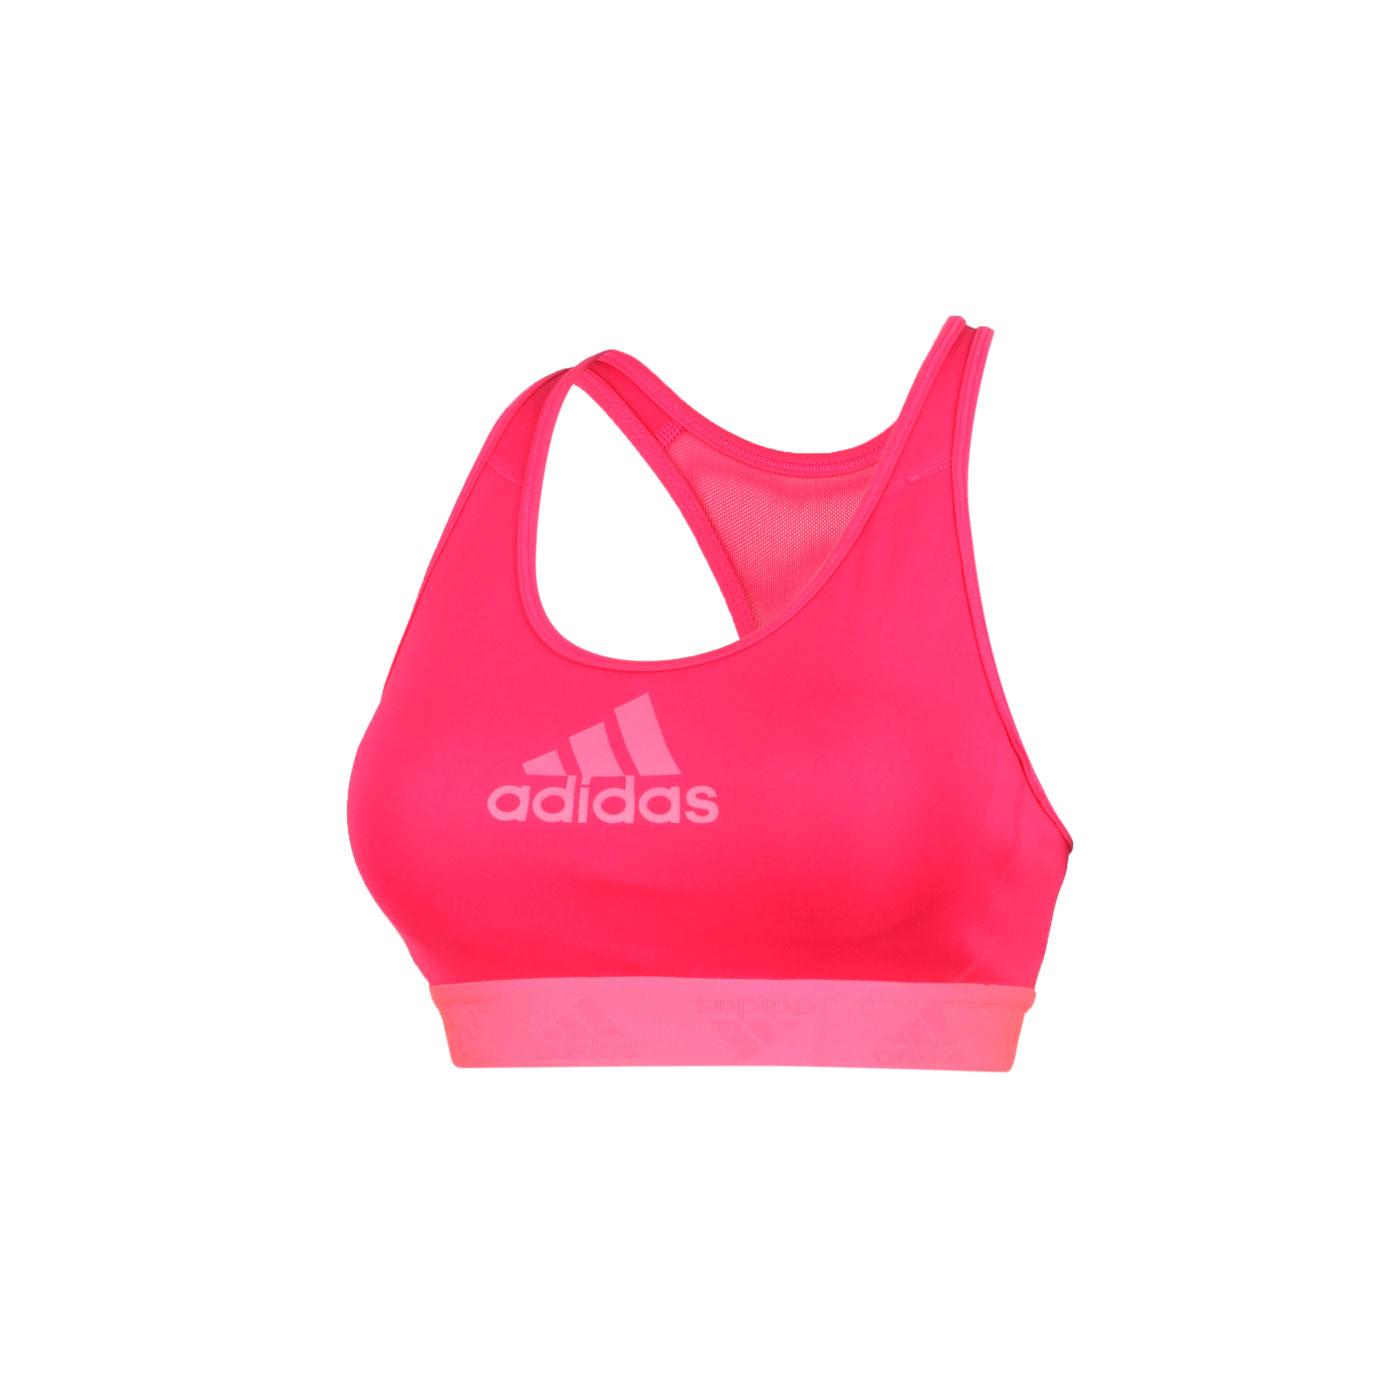 ADIDAS 女款運動內衣 GK0298